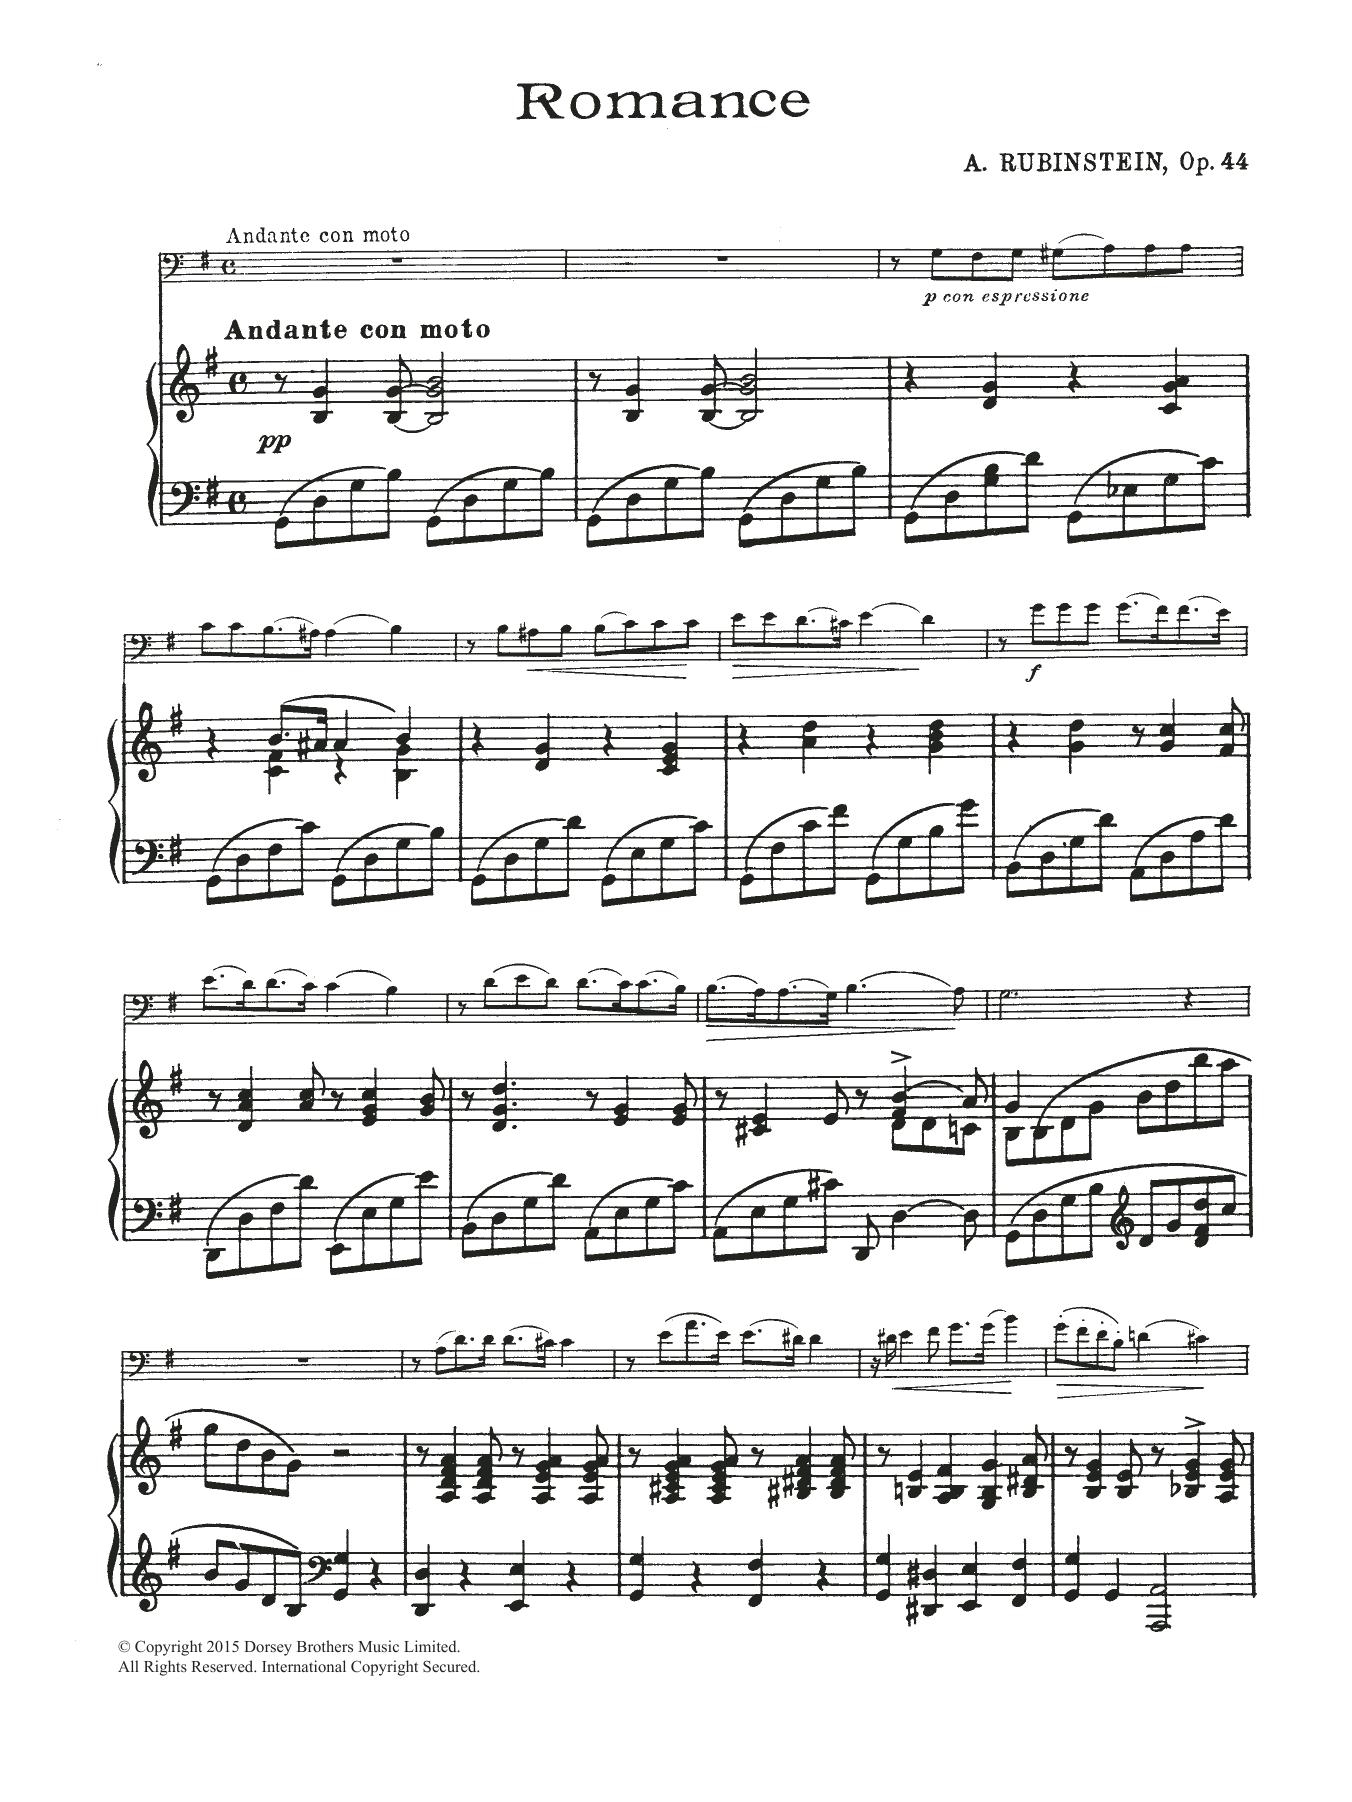 Anton Rubinstein: Romance, Op.44 No. 1